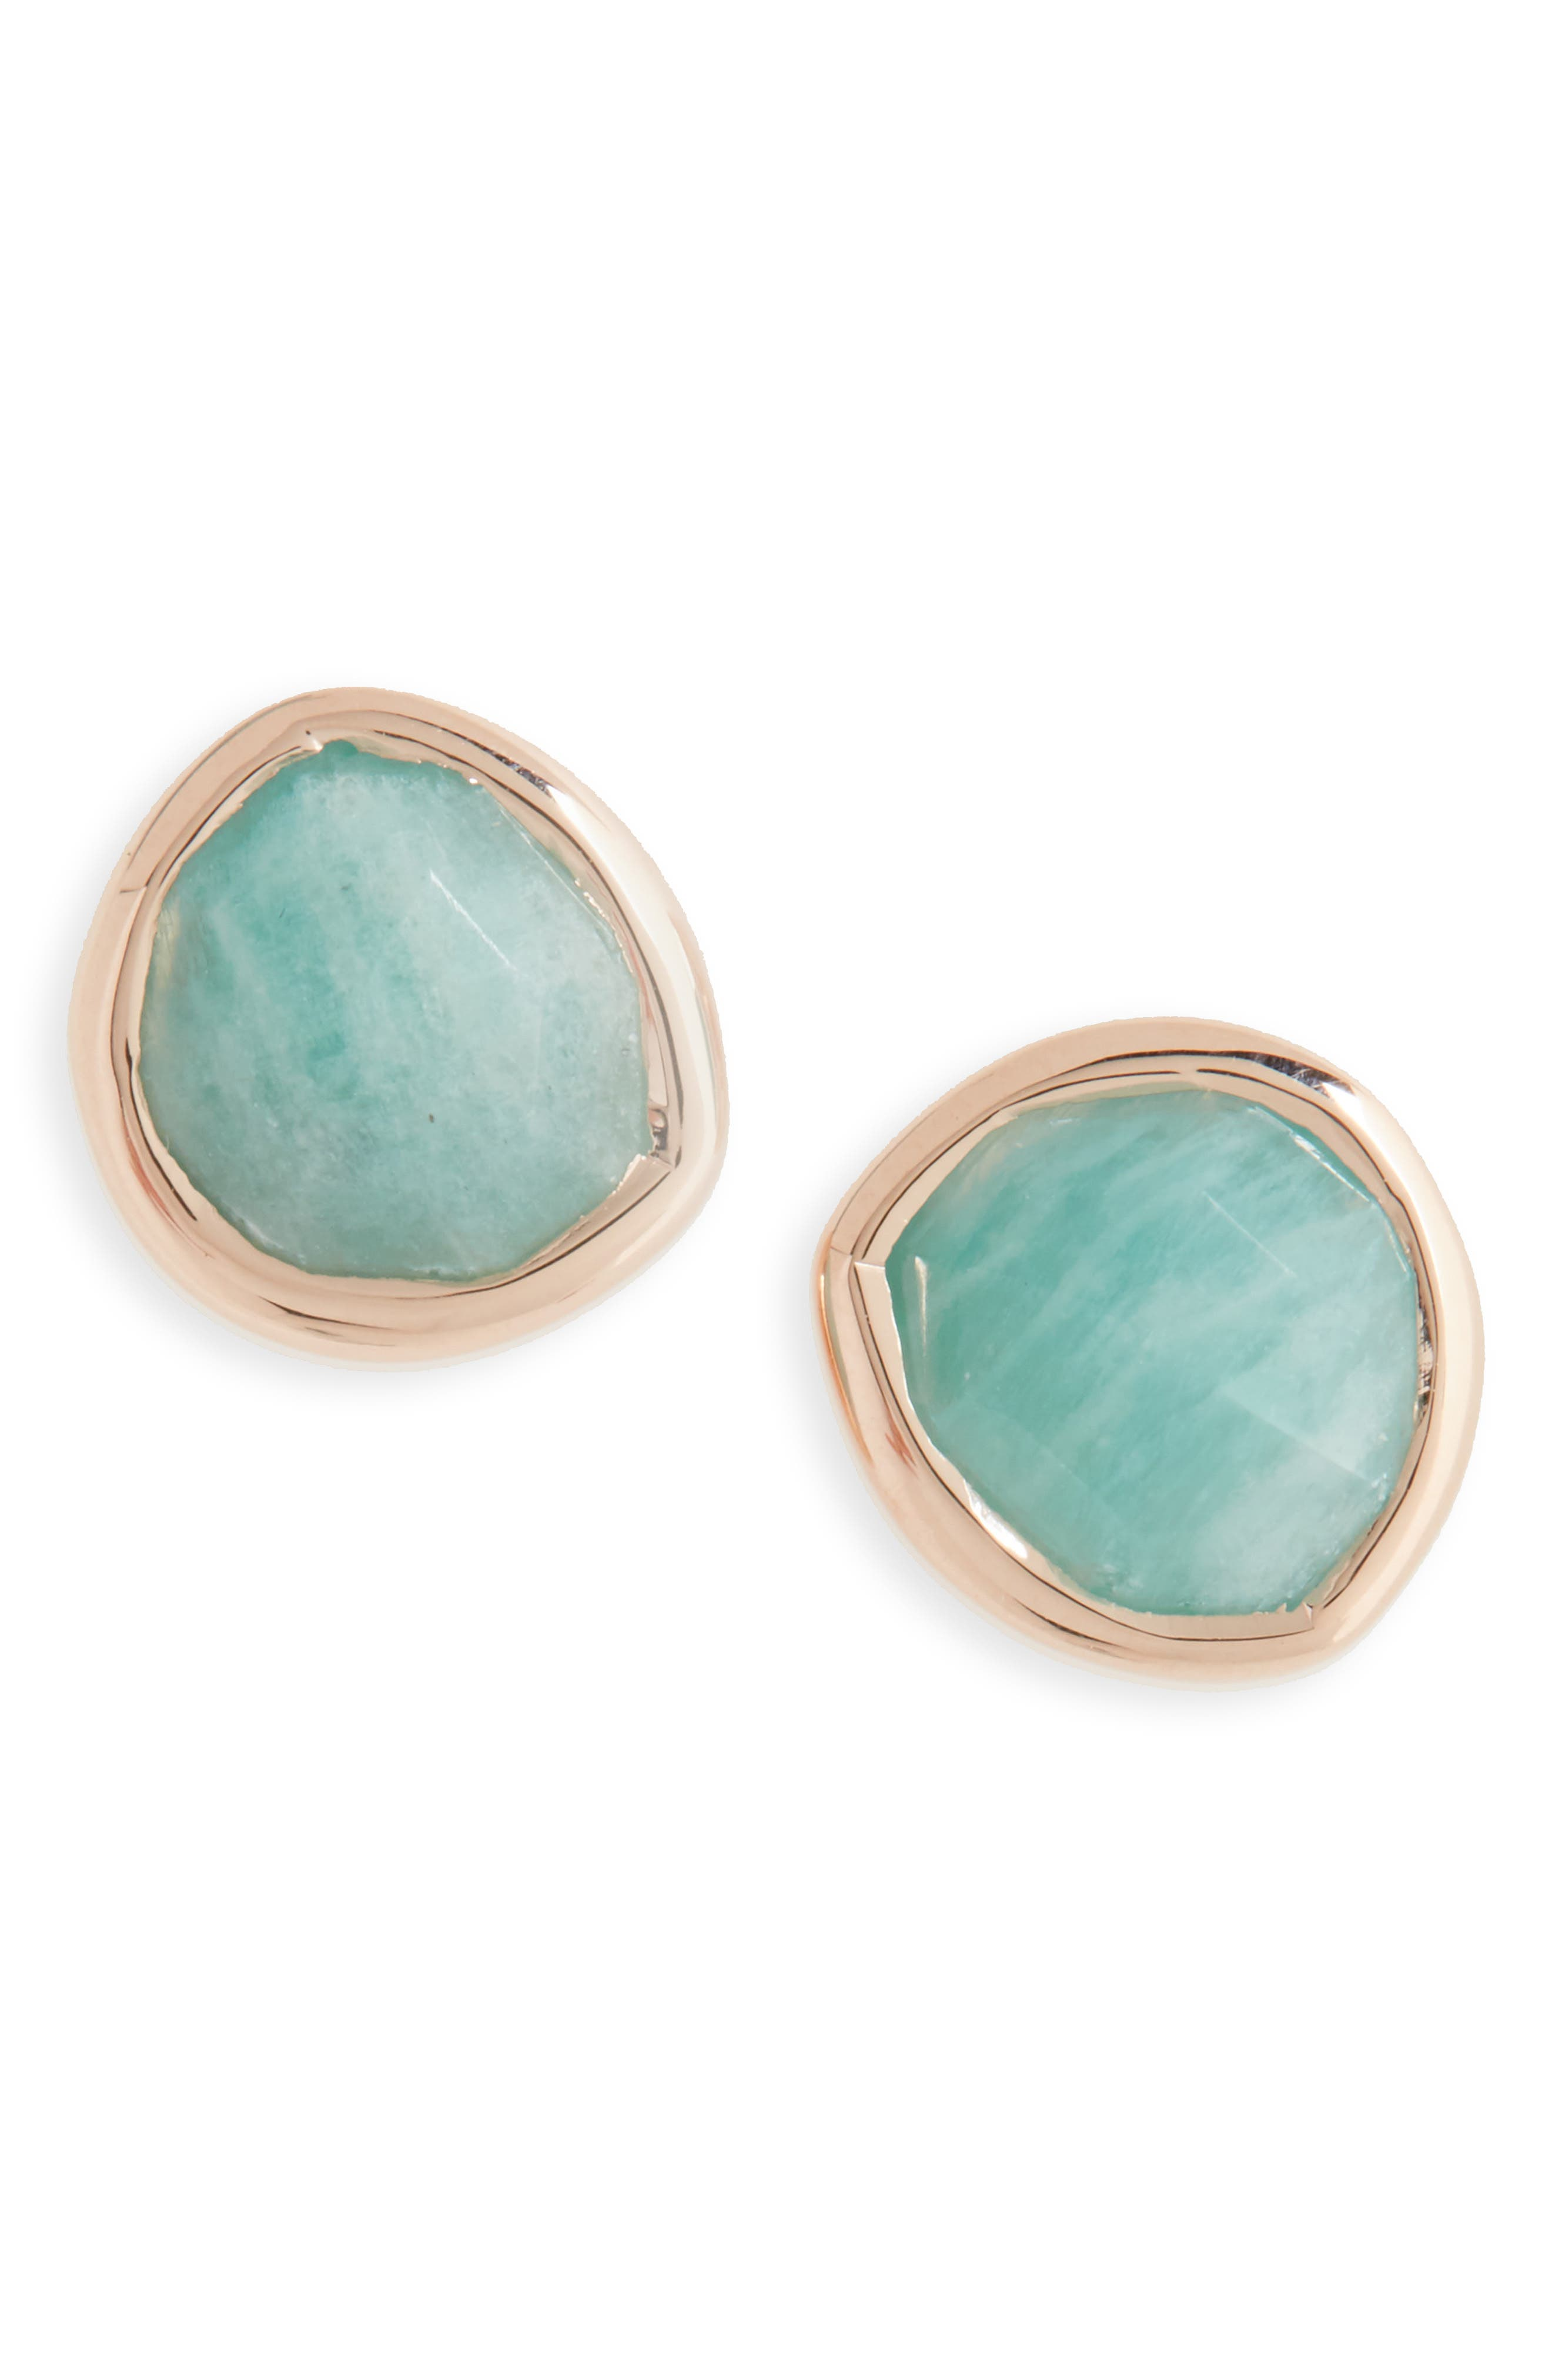 'Siren' Semiprecious Stone Stud Earrings, Main, color, AMAZONITE/ ROSE GOLD